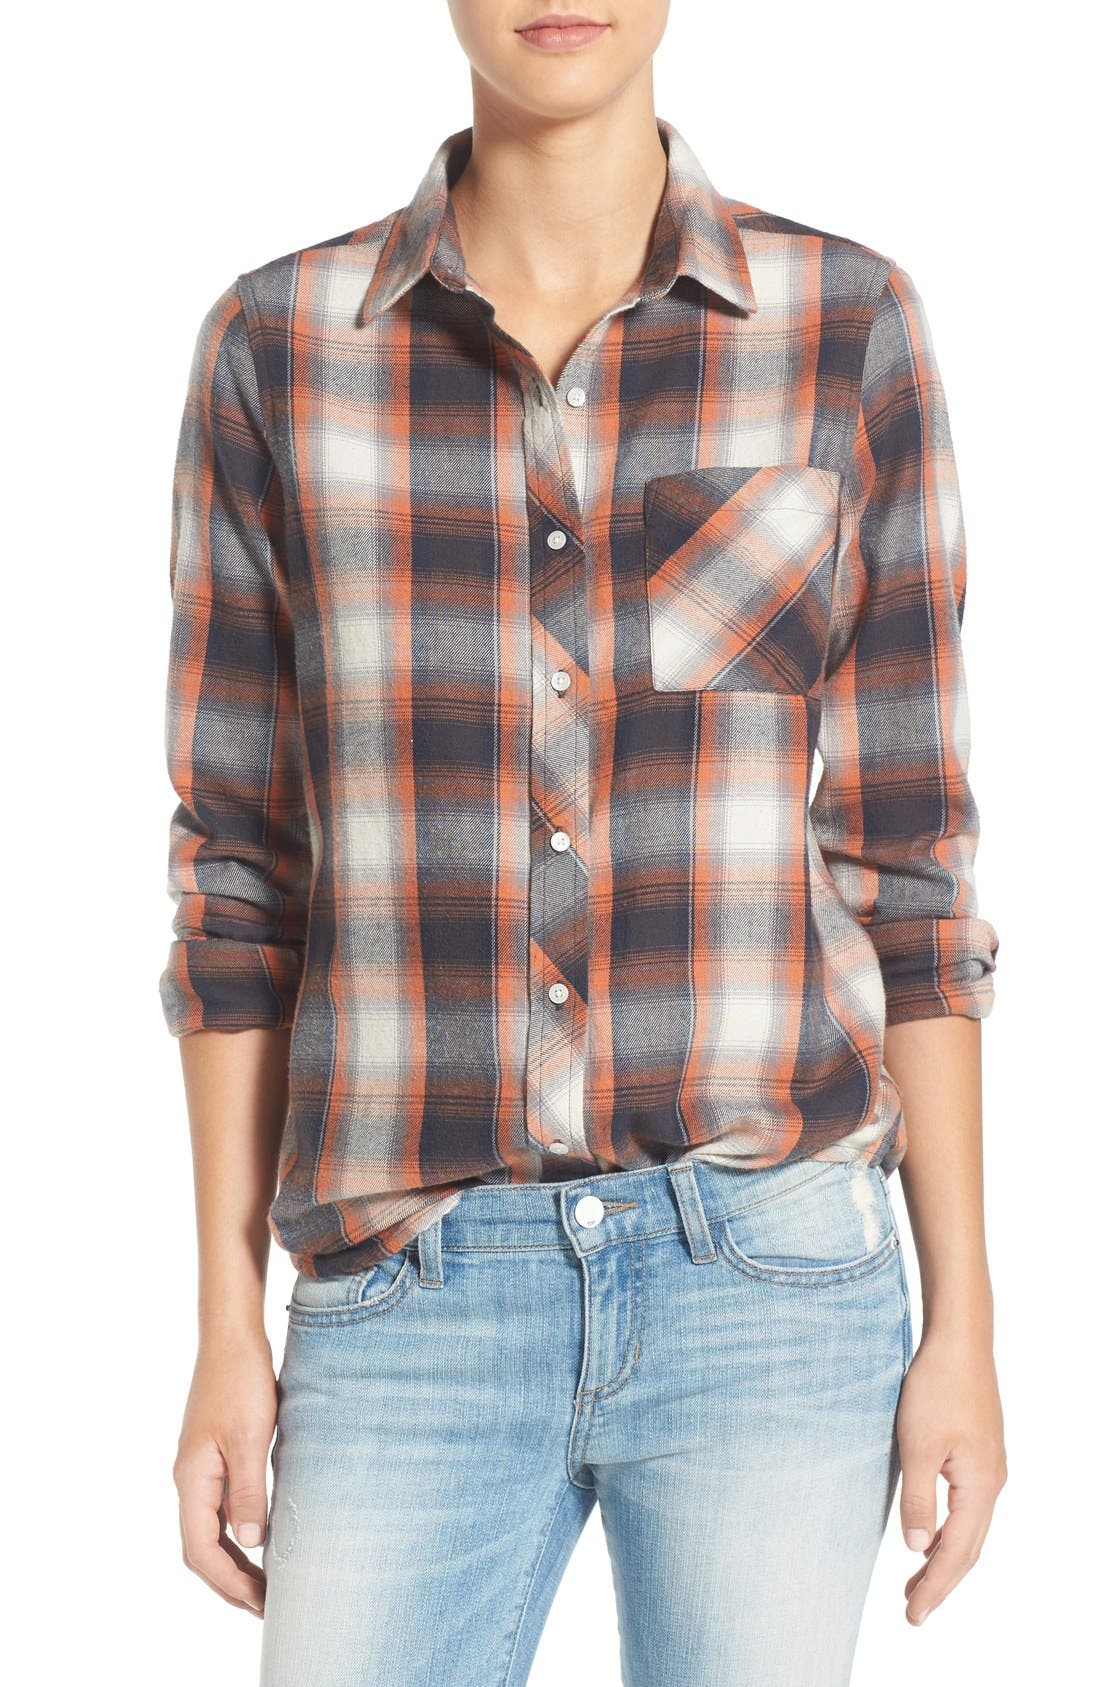 Alternate Image 1 Selected - Rip Curl 'Zarca' Plaid Flannel Shirt